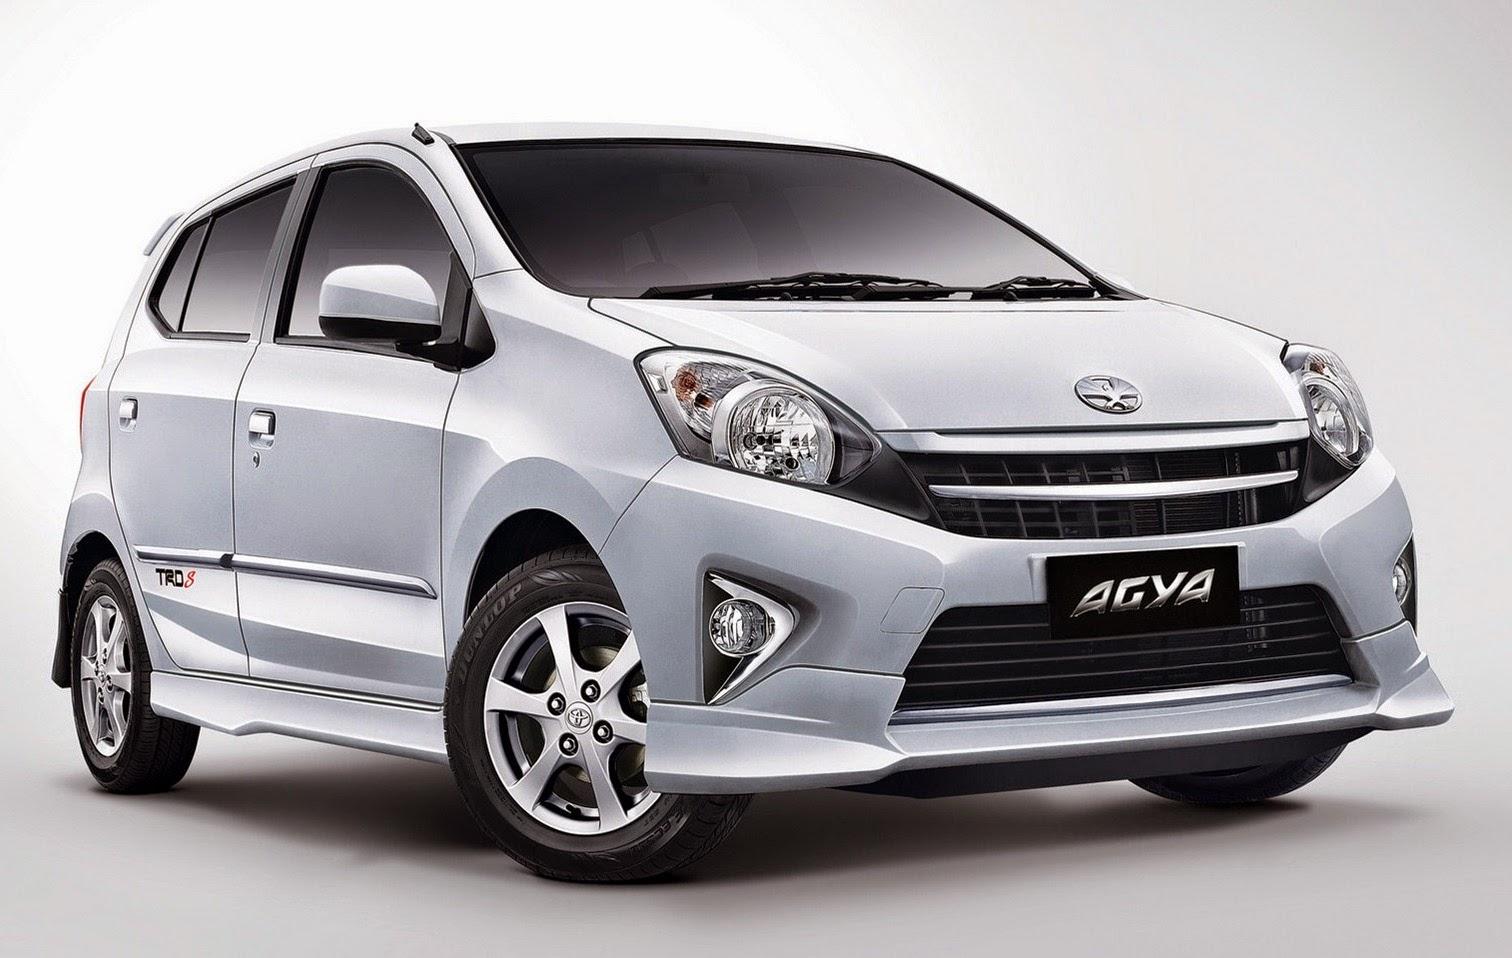 Toyota Yaris Trd 2015 Harga Turbo Kit Agya Dan Spesifikasi Mobilku Org